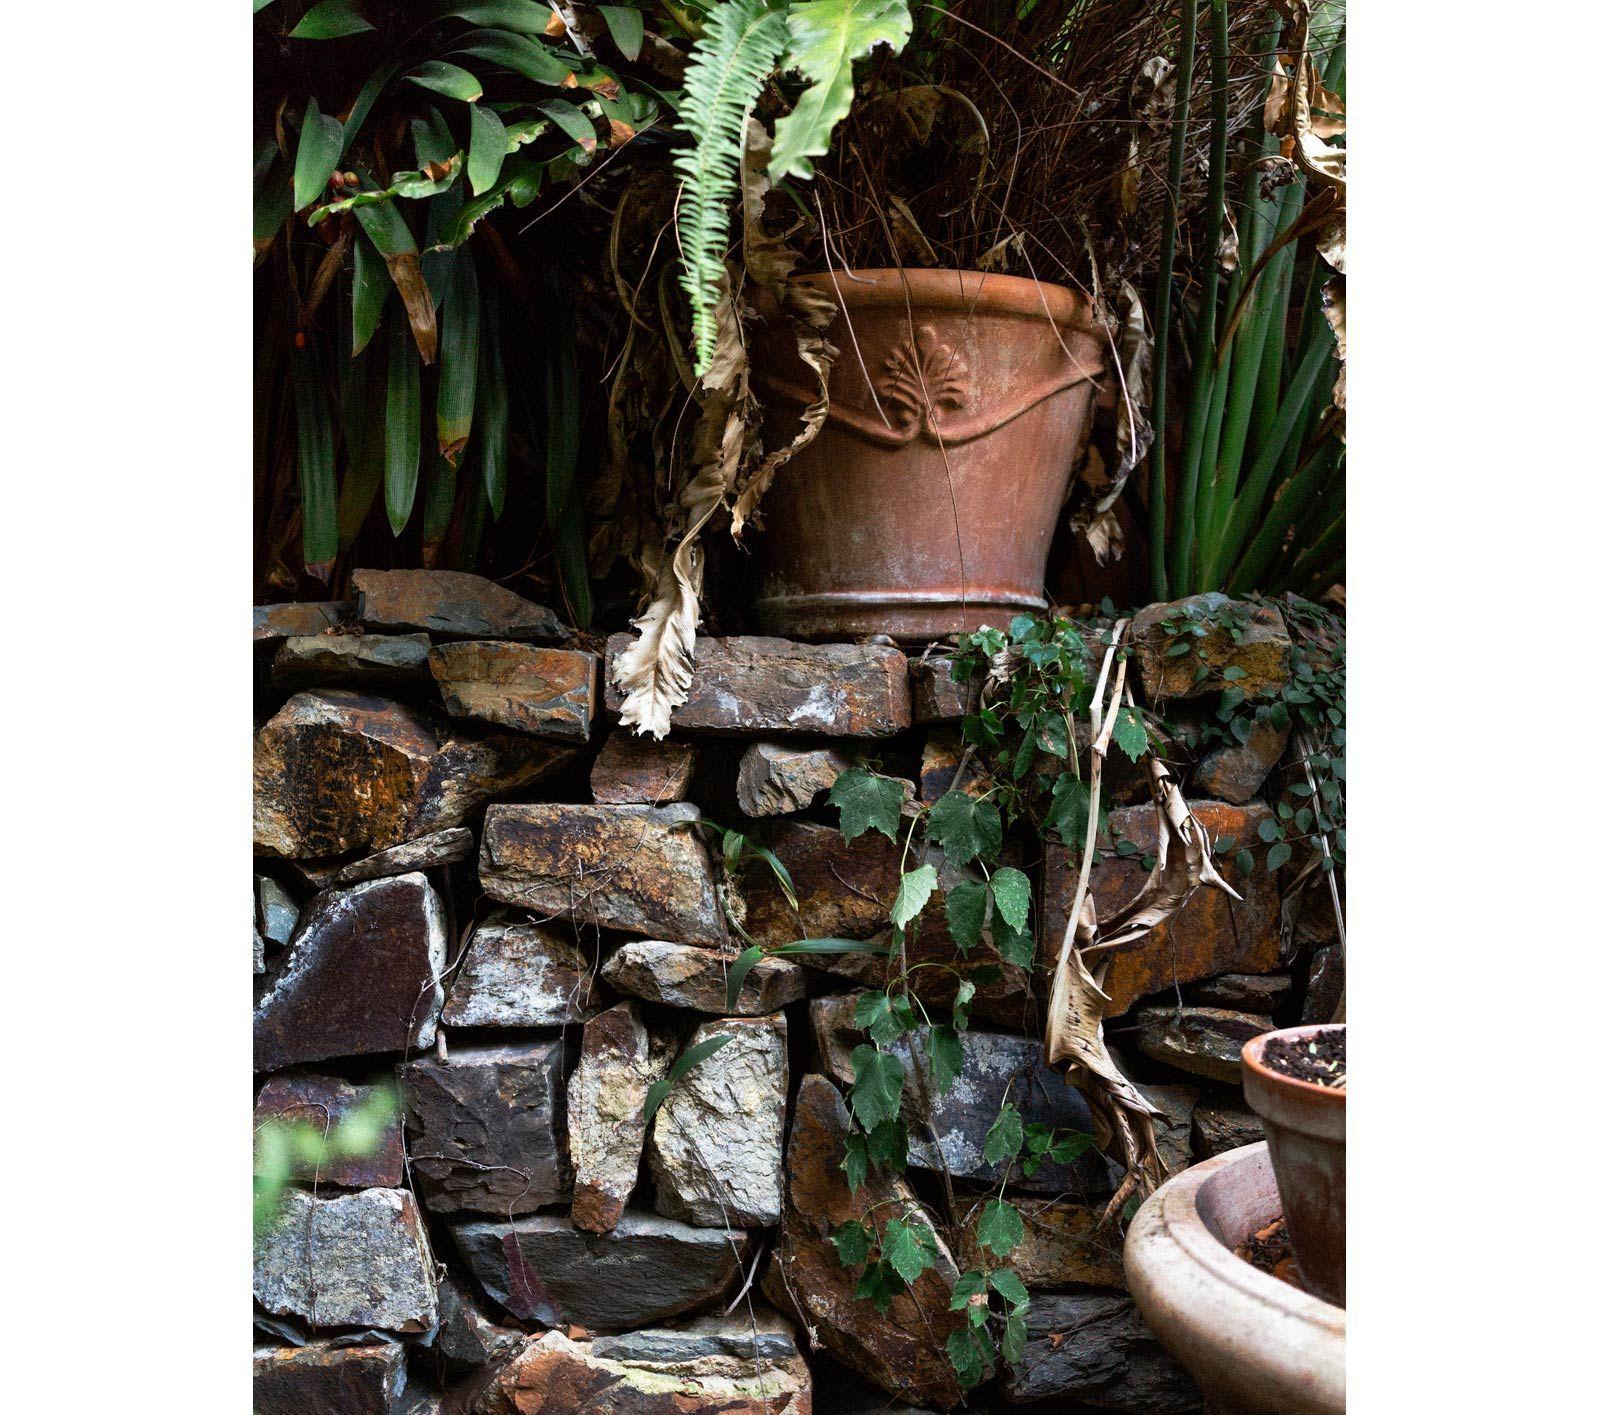 Urban Vegetable Gardening For Beginners: Bill Henson's Post-Industrial Walled Garden